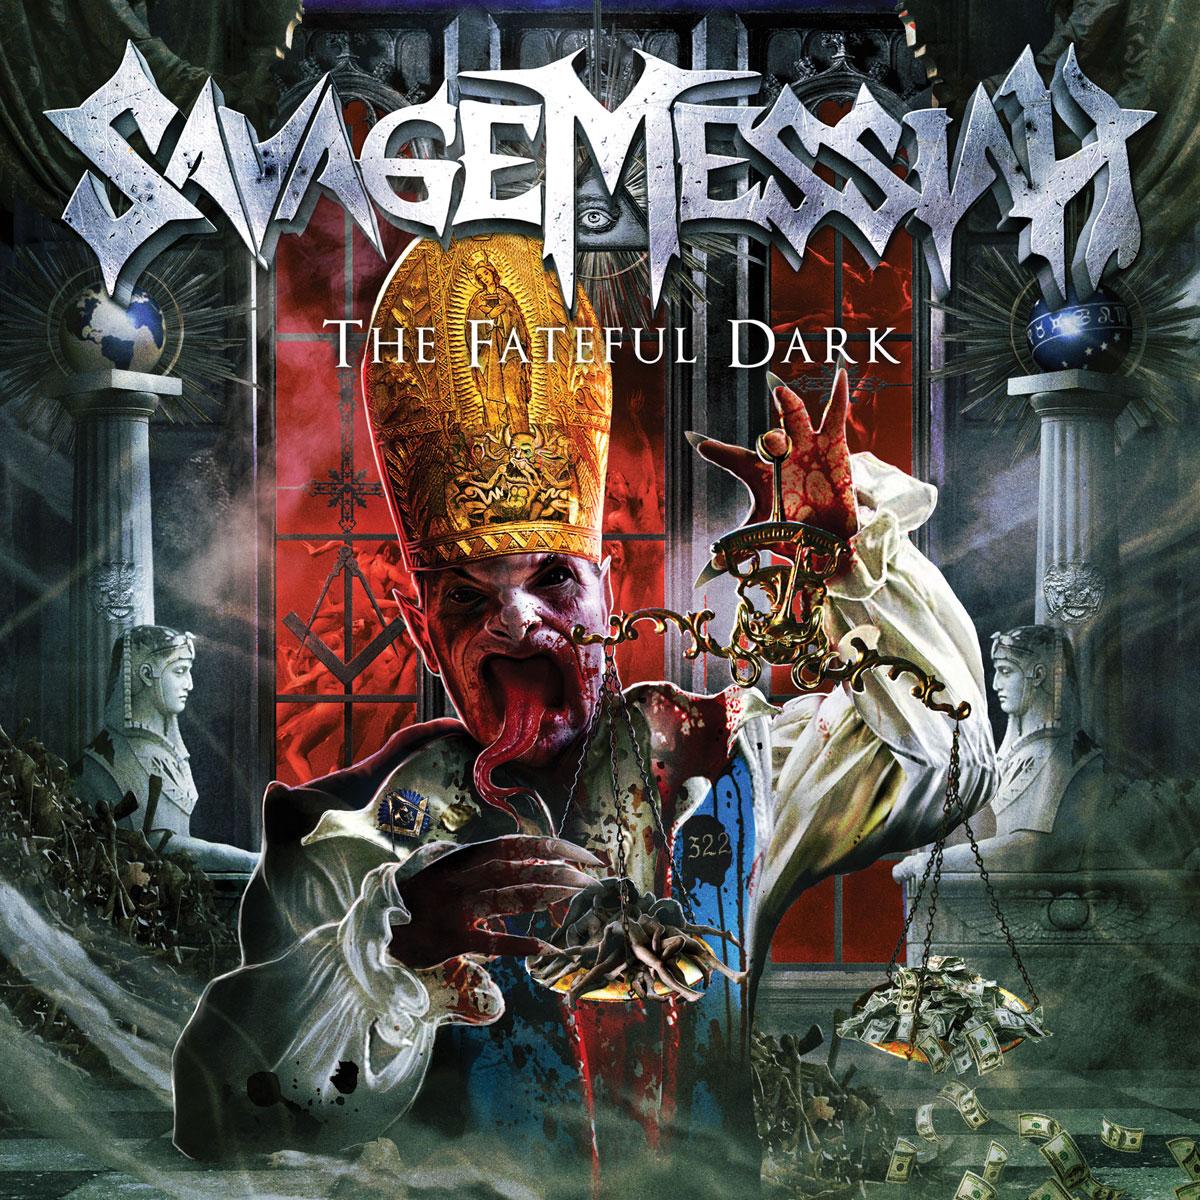 Savage Messiah – The Fateful Dark